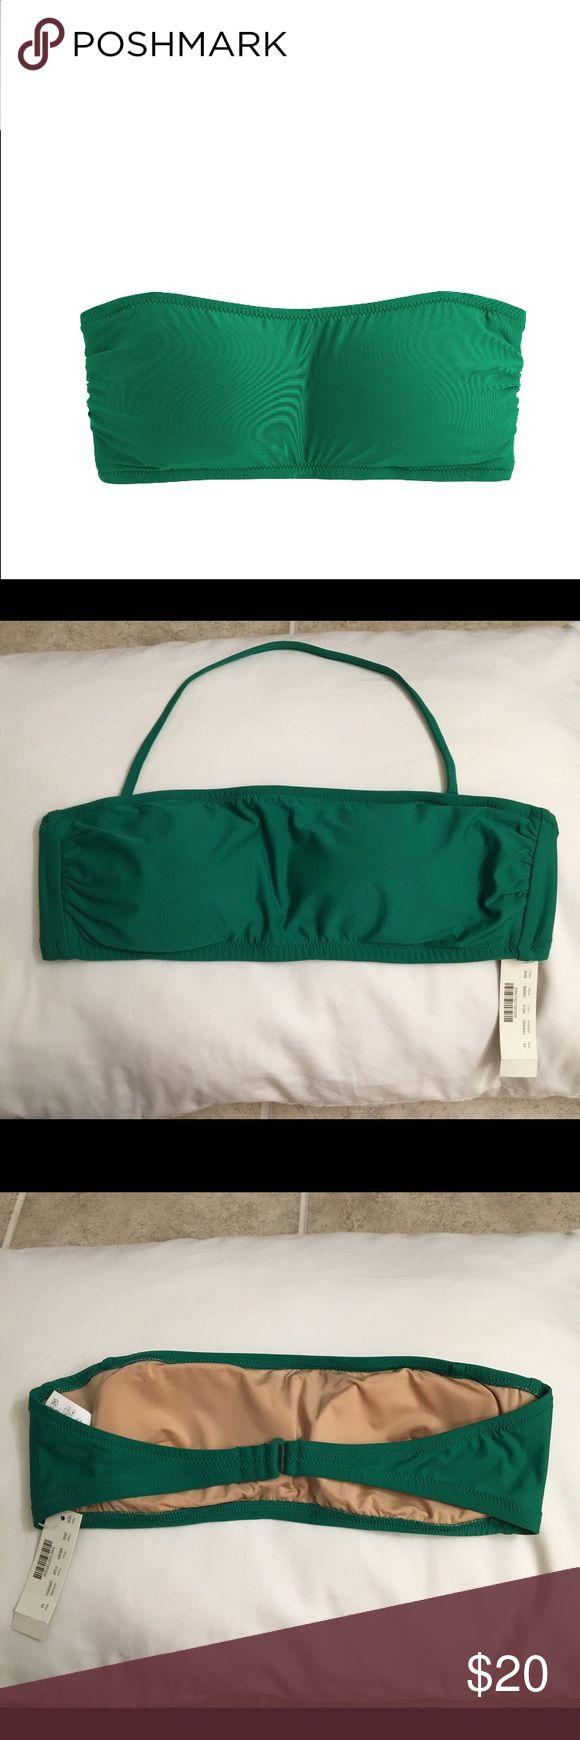 NWT J Crew Bikini Medium bandeau bikini top with optional neck strap. Medium bikini bottom. J Crew's Festive Green. J. Crew Swim Bikinis